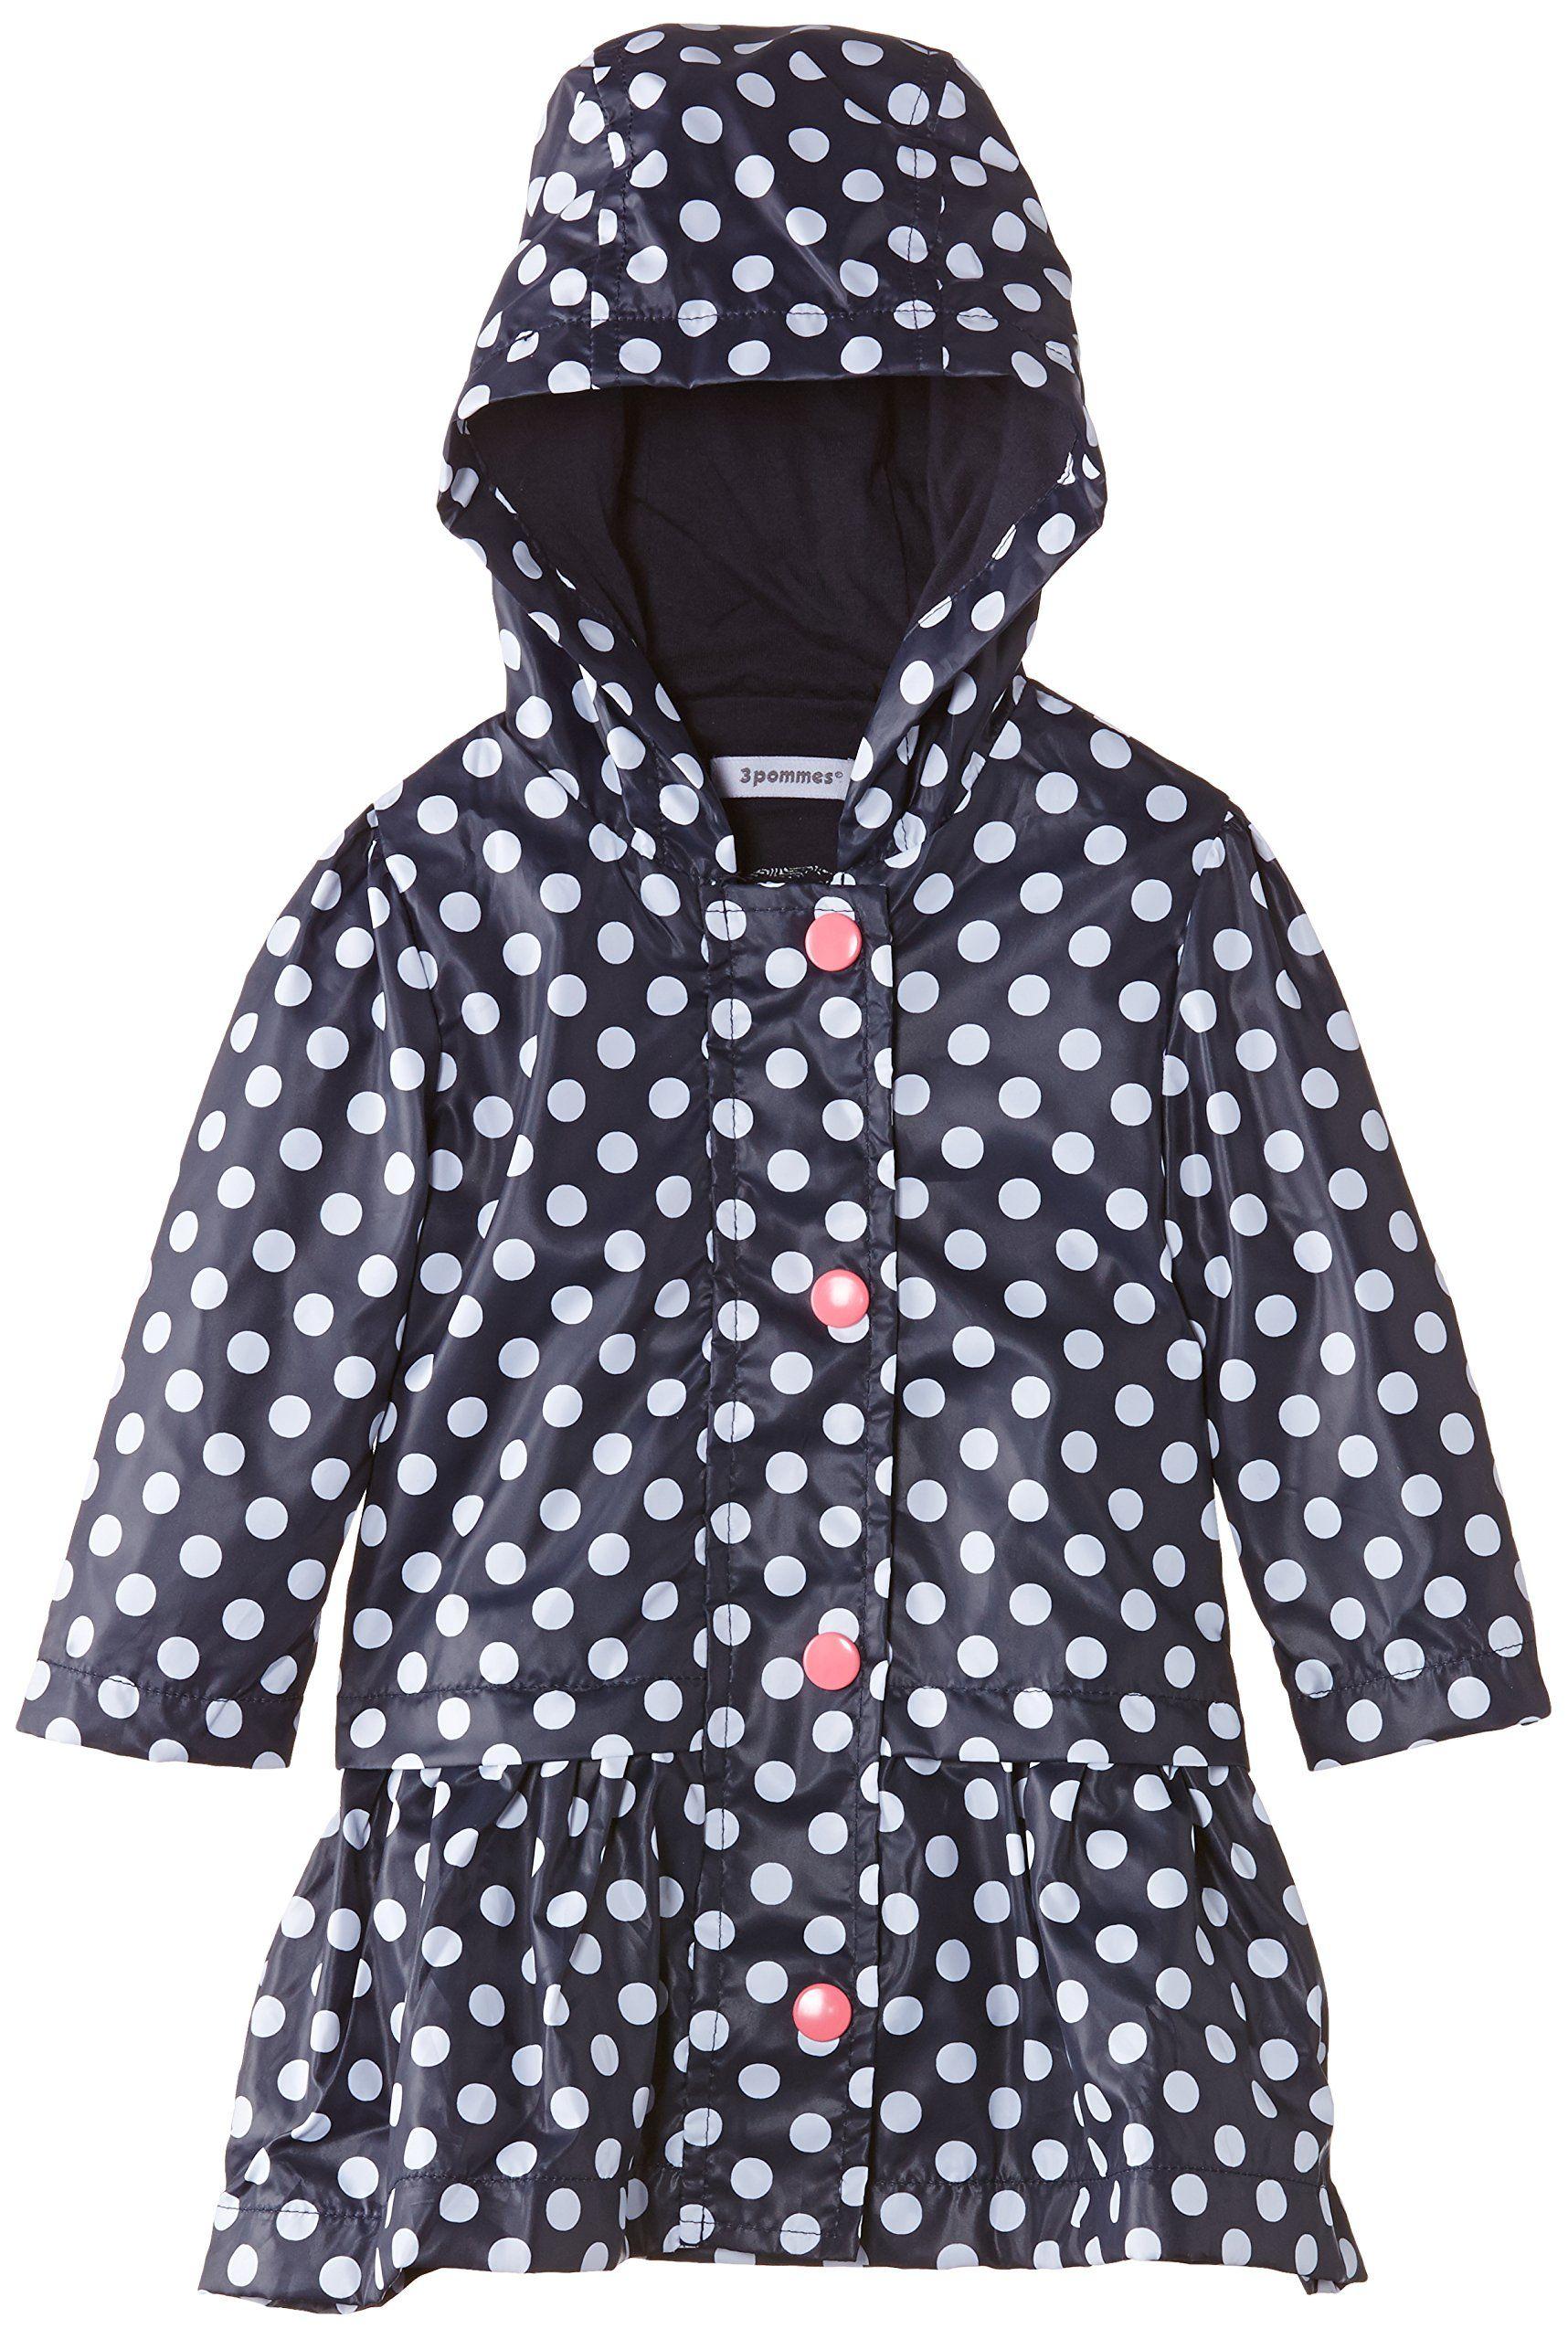 937c24bed98e 3Pommes Baby-Girls Parka Capuche Polka Dot Waterproof Jacket